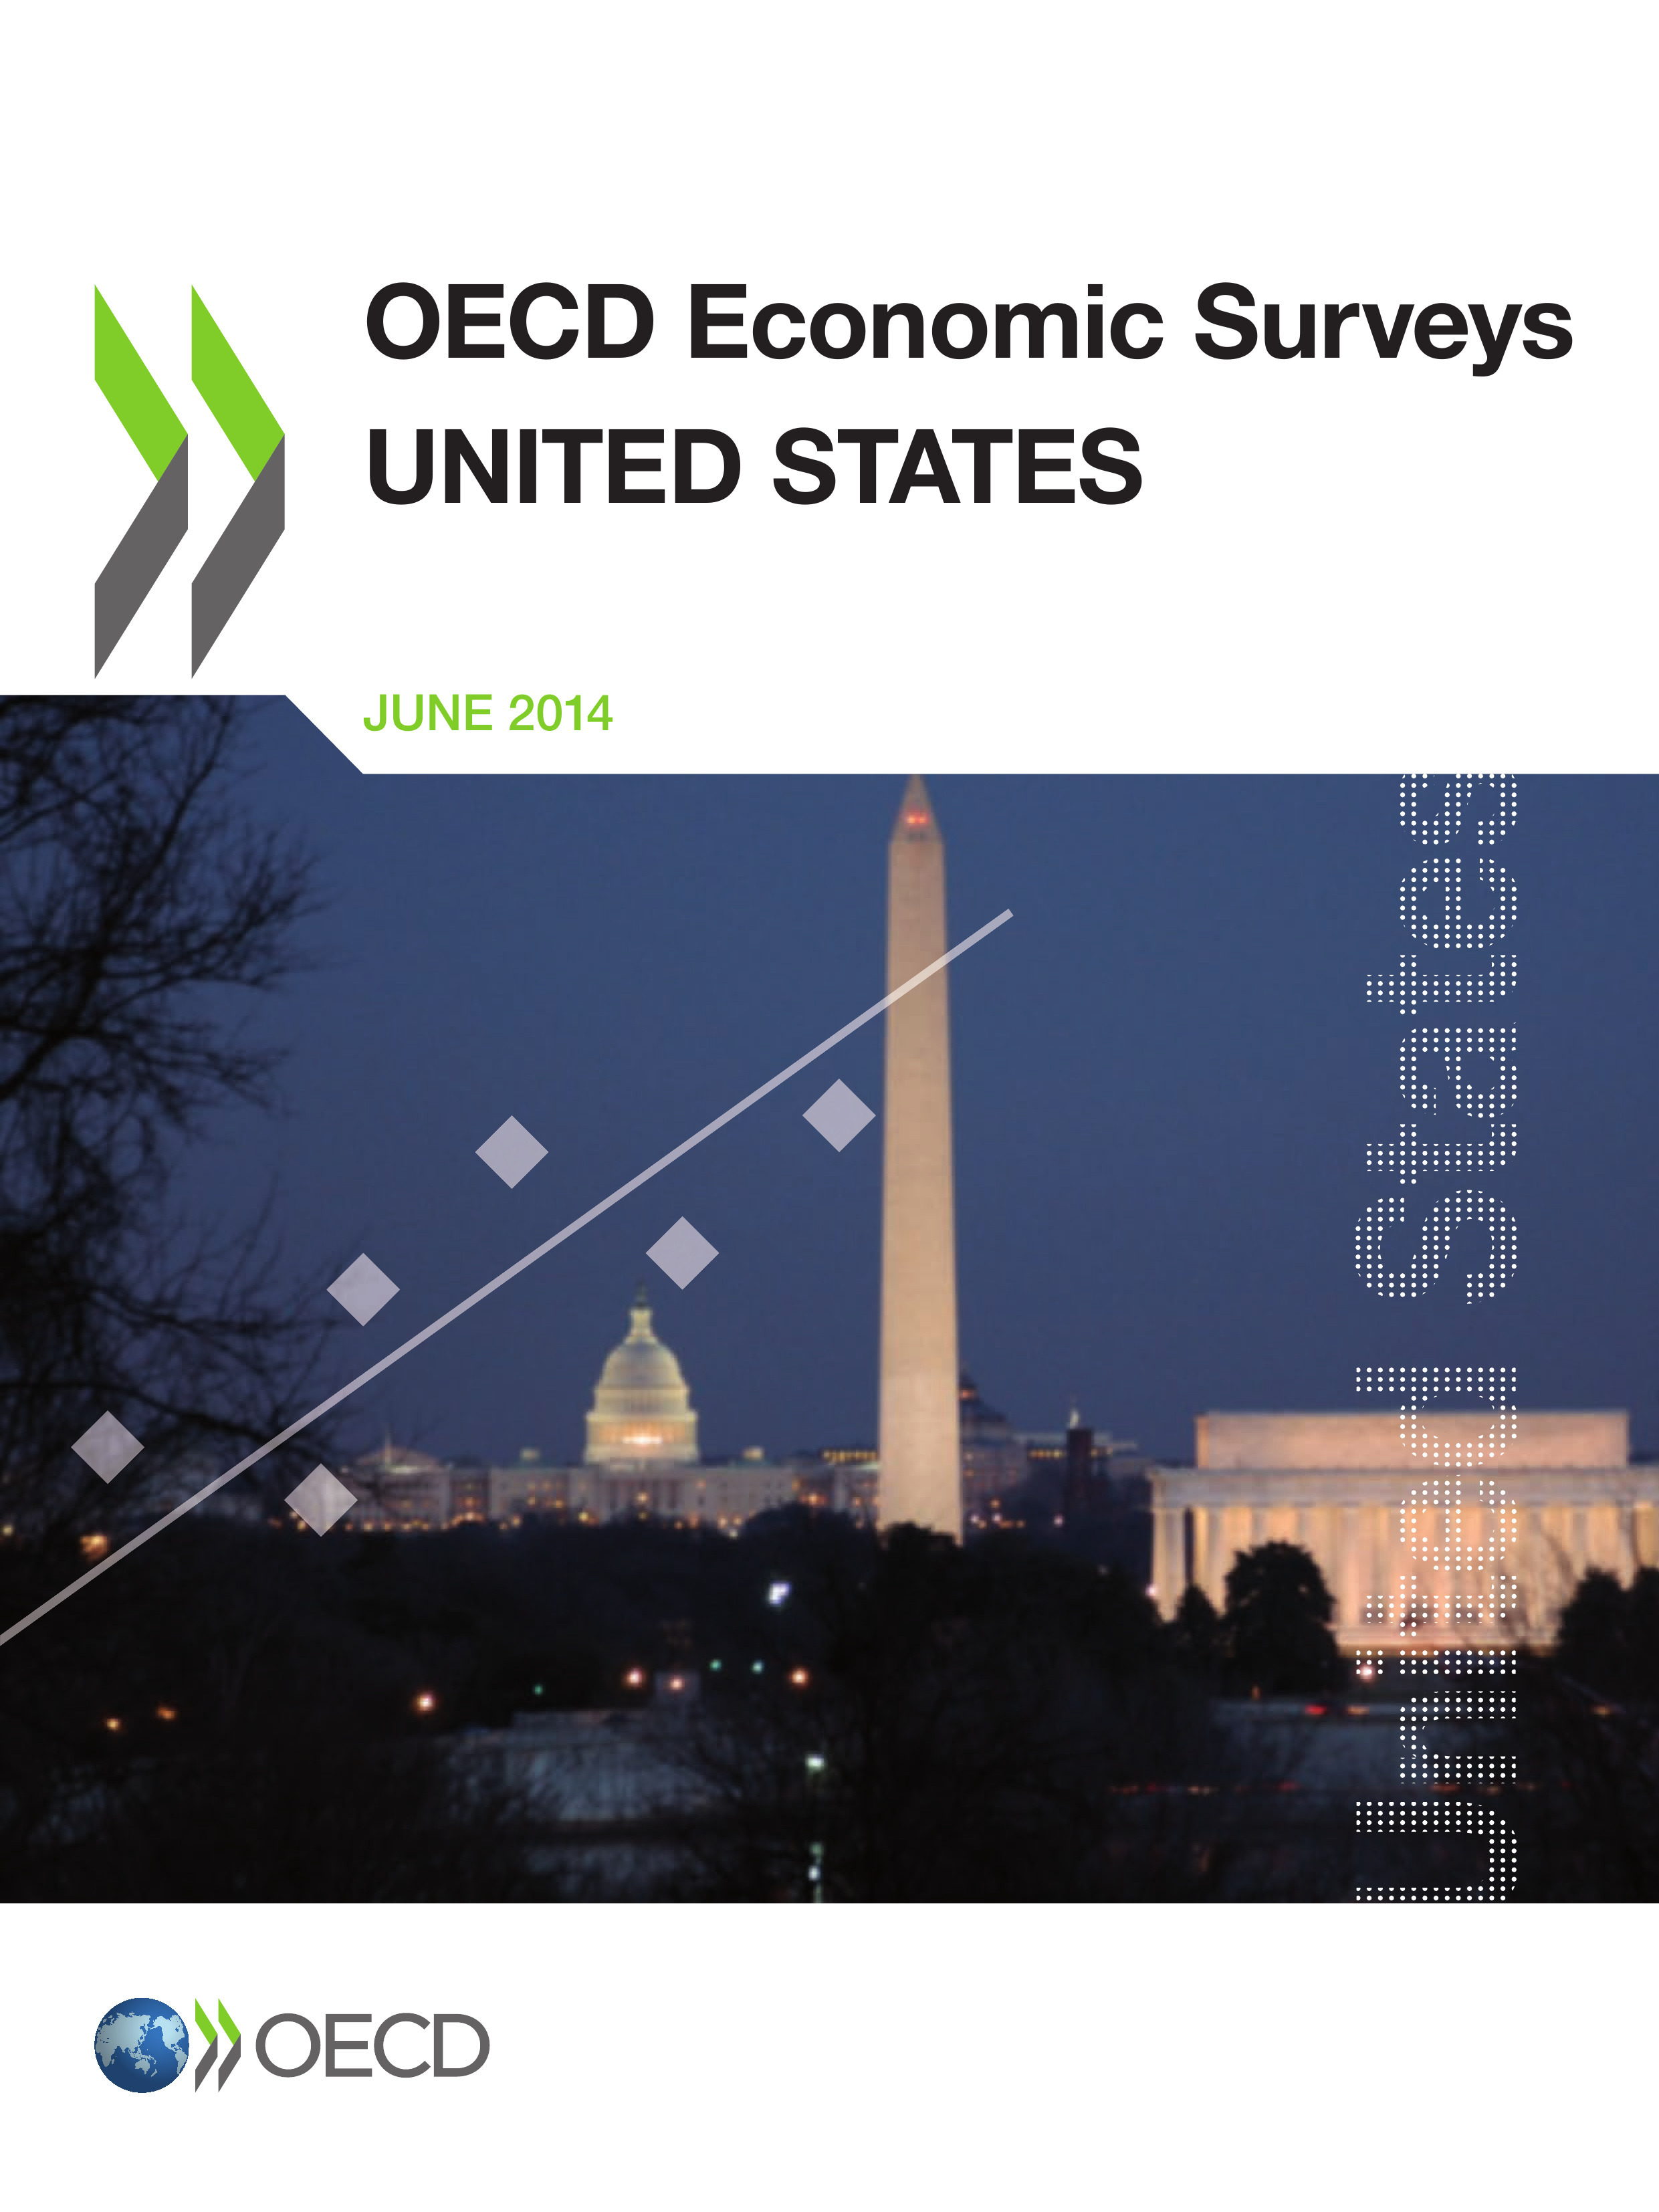 United States ; OECD Economic Surveys (édition 2014)